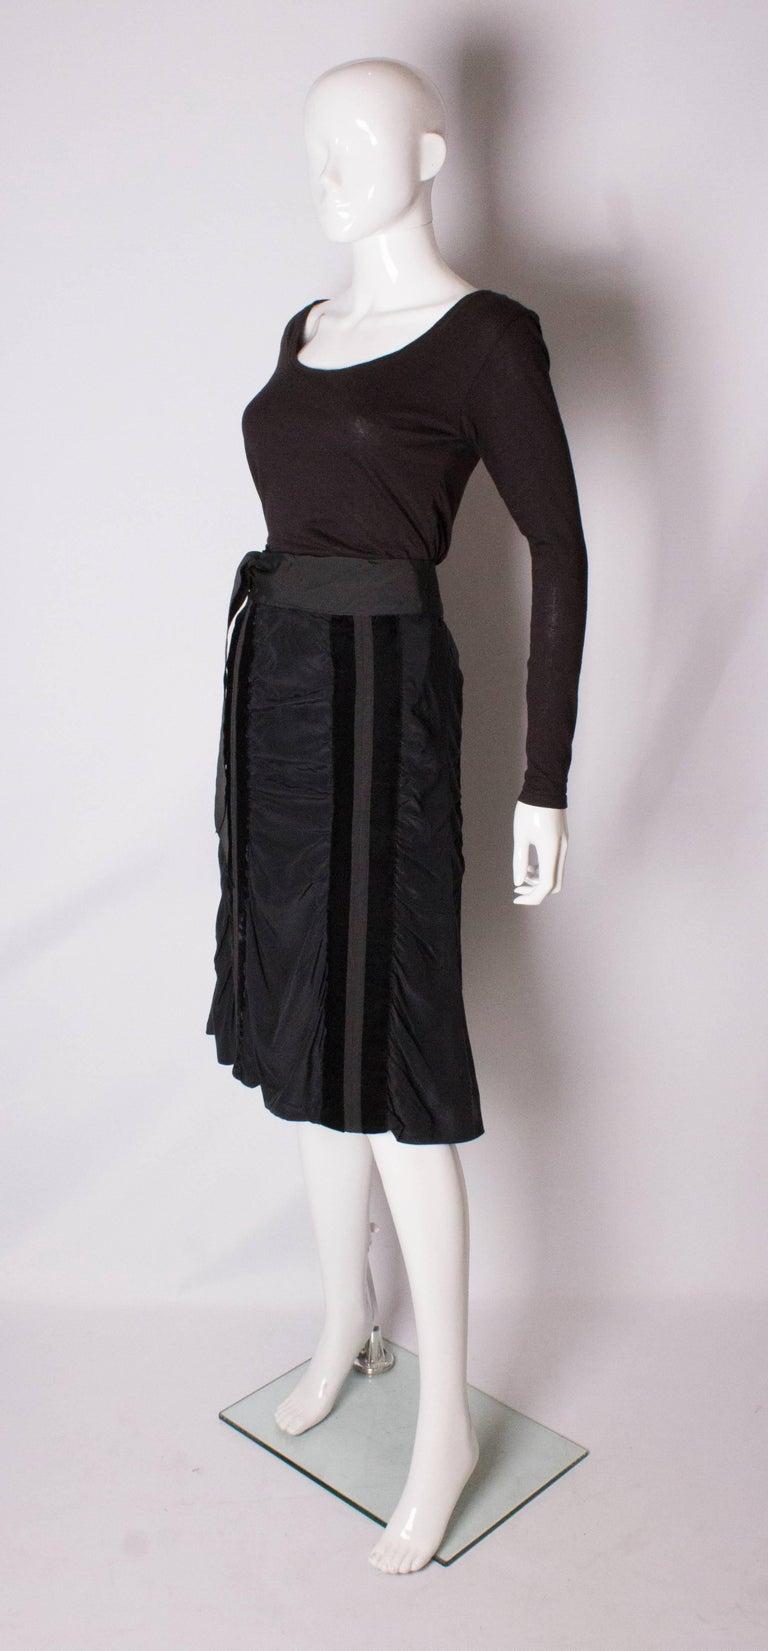 Black Yves Saint Laurent Rive Gauche Vintage Skirt For Sale